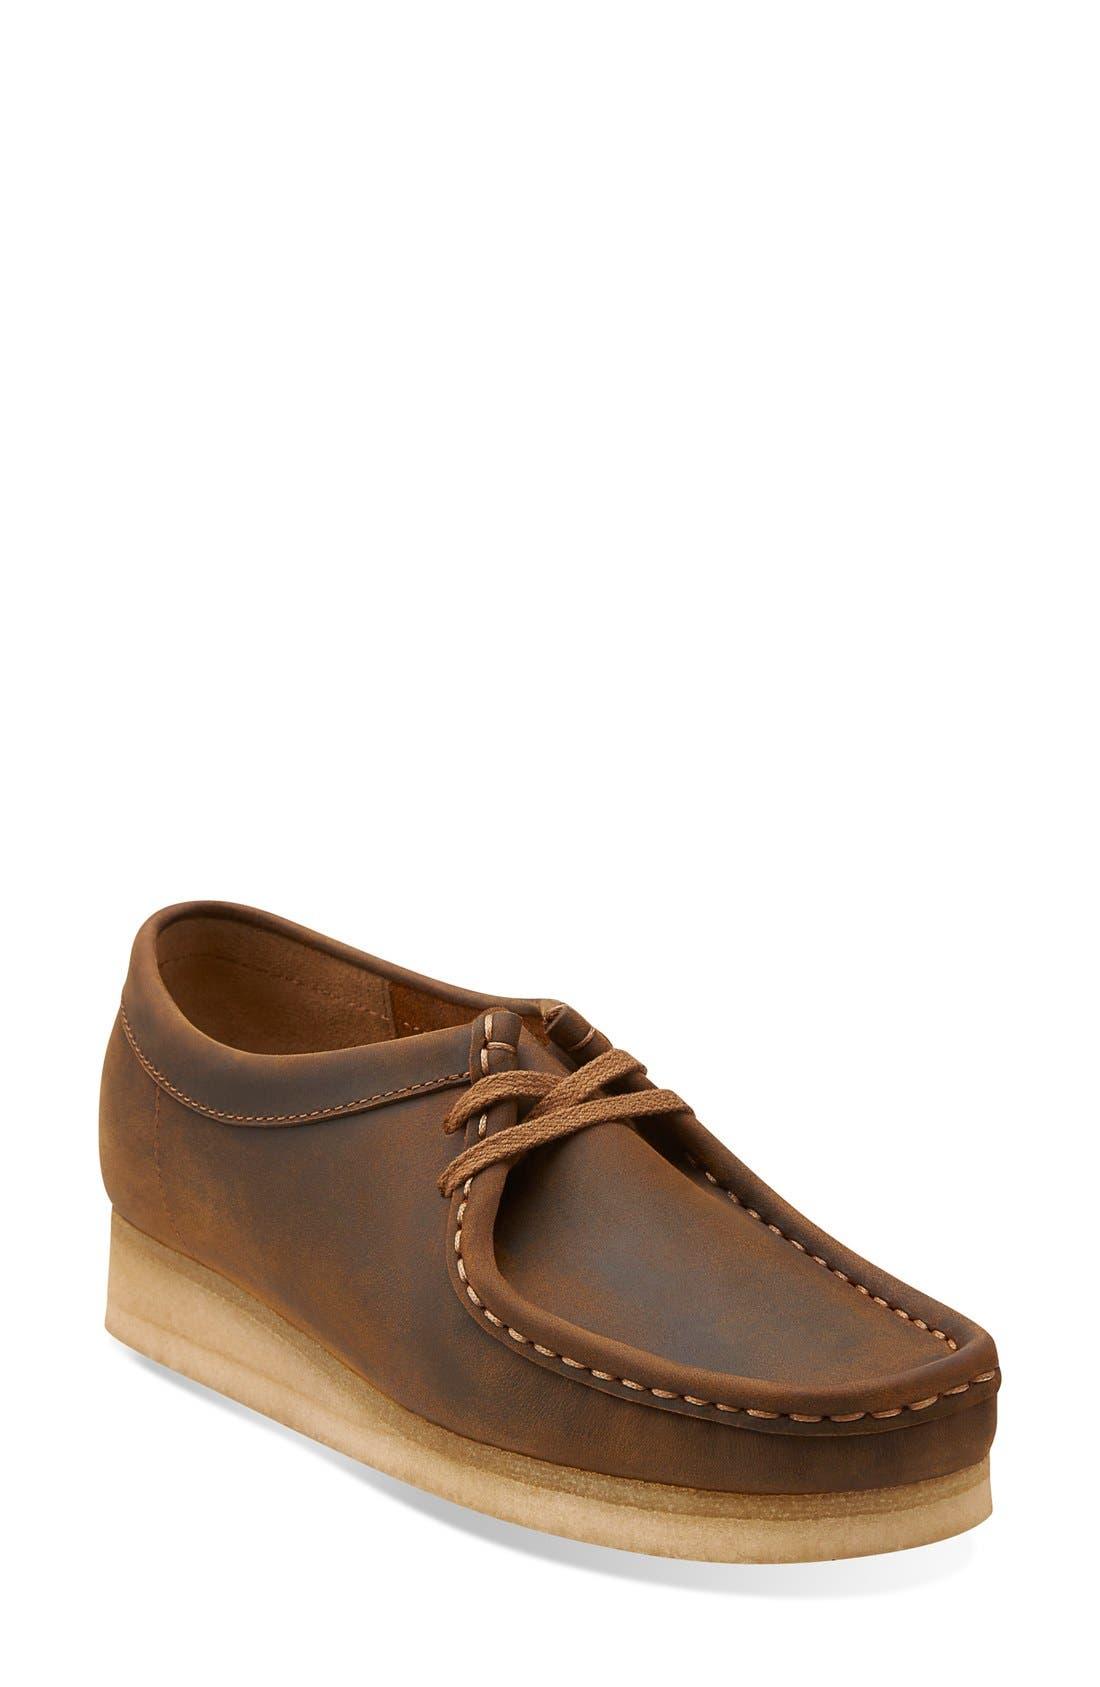 'Wallabee' Chukka Boot,                             Main thumbnail 1, color,                             Beeswax Leather